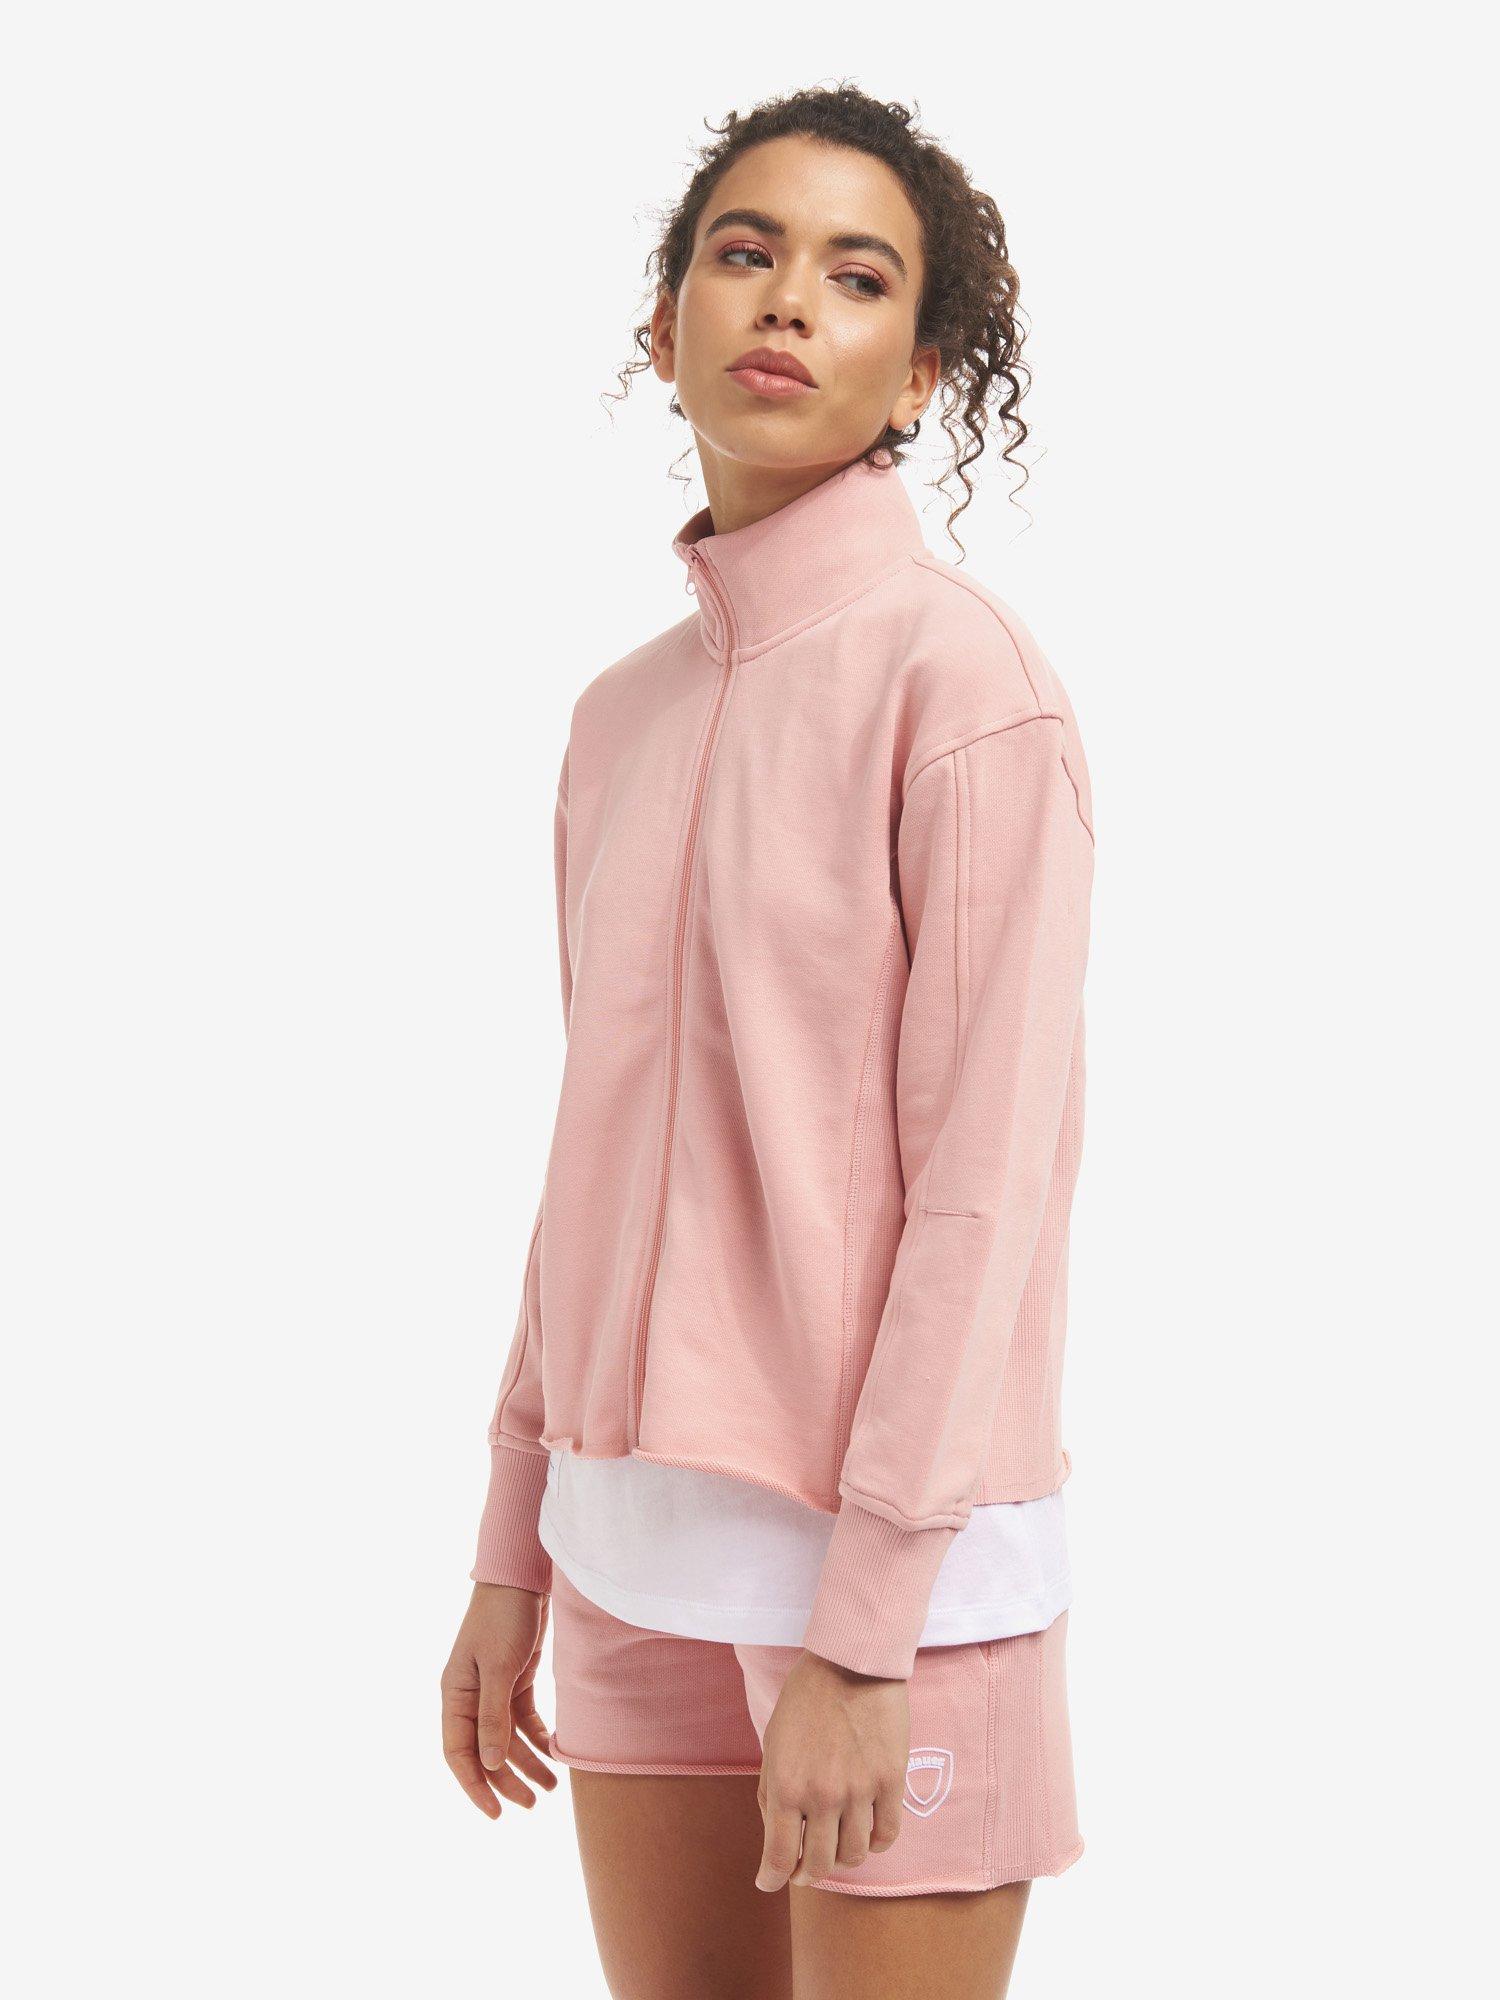 Blauer - VESTE MOLLETONNÉE AVEC ZIP - Soft Pink - Blauer